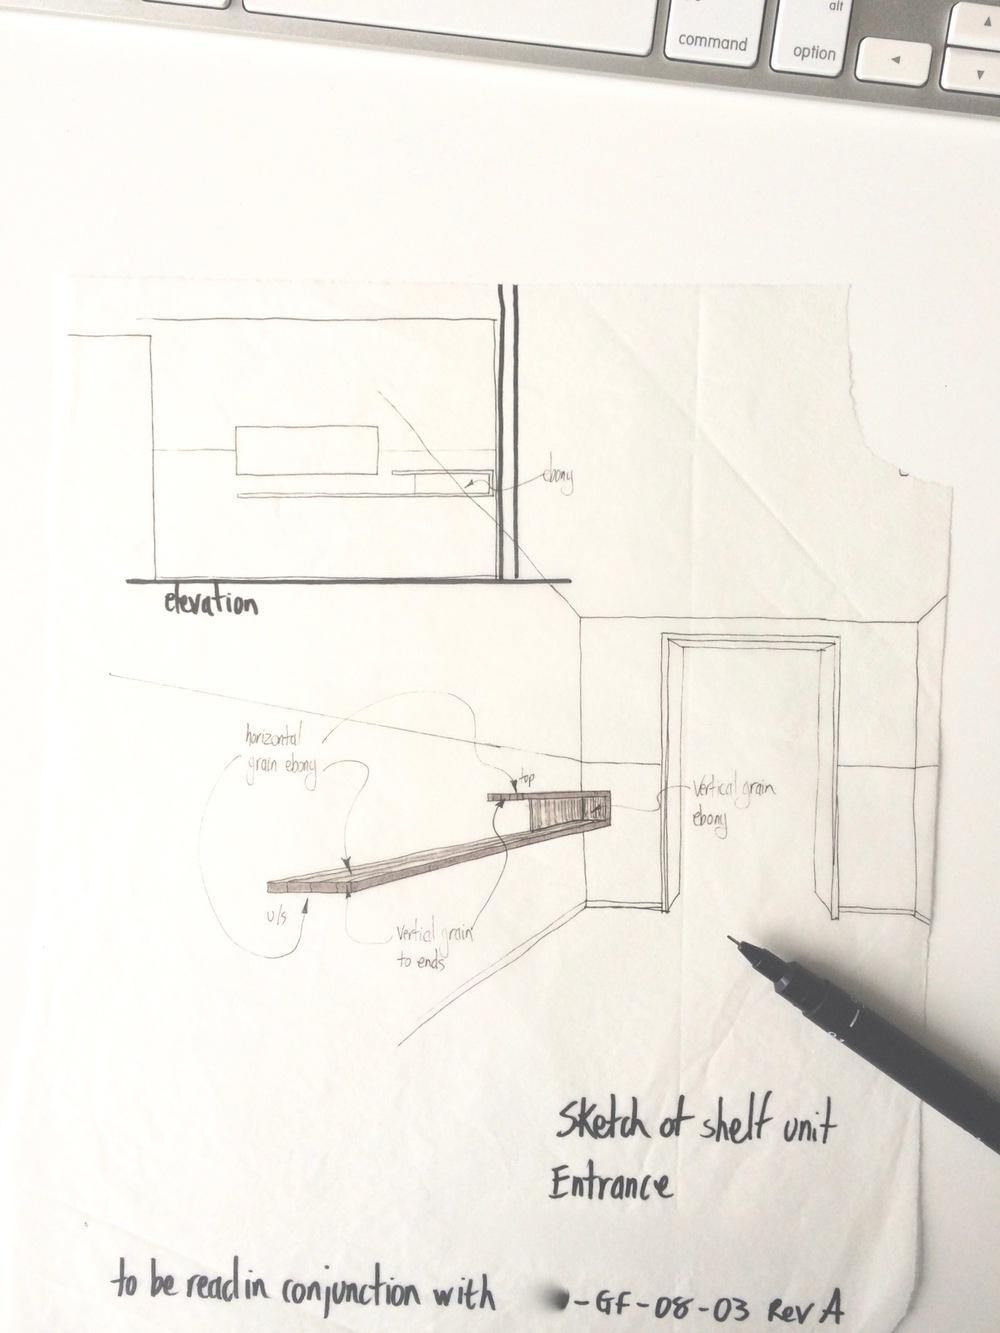 aine-sketch-design-8-weeks-entrance-shelf.jpg